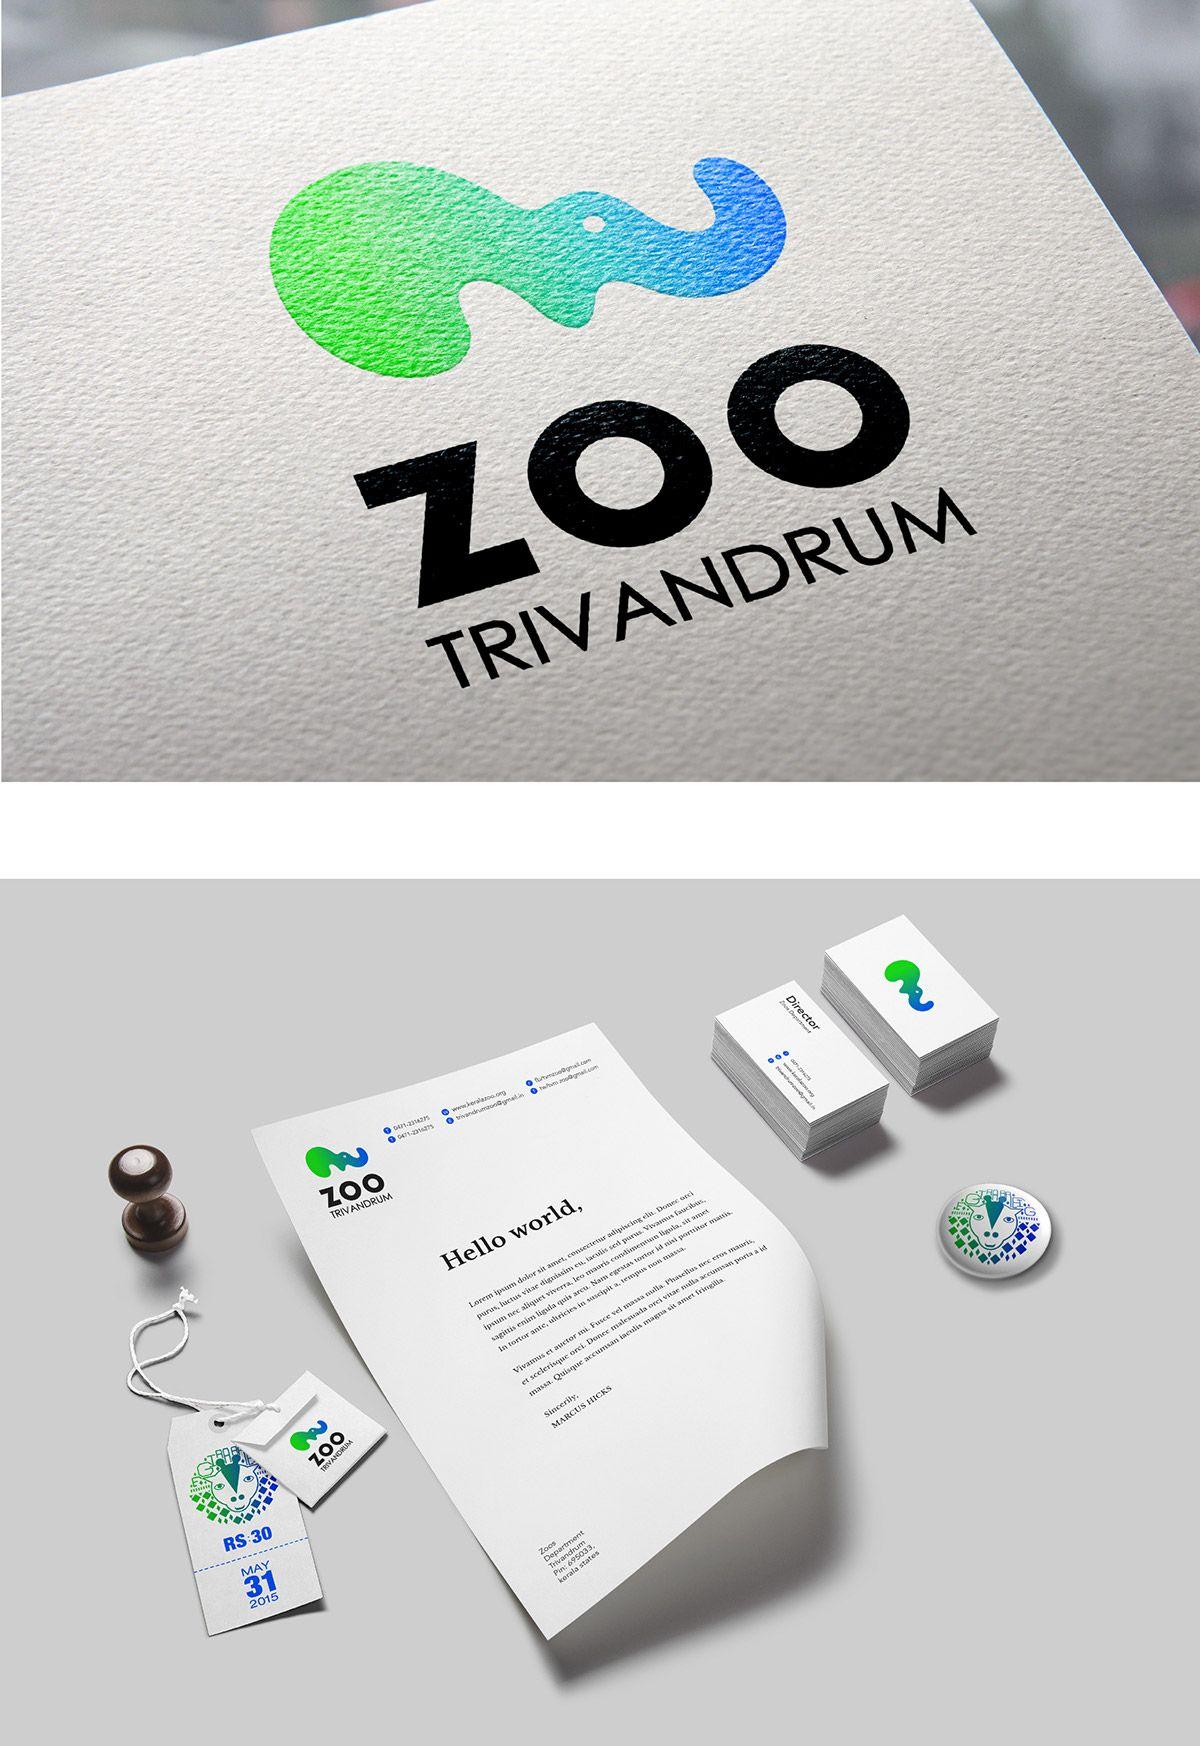 trivandrum zoo on Behance